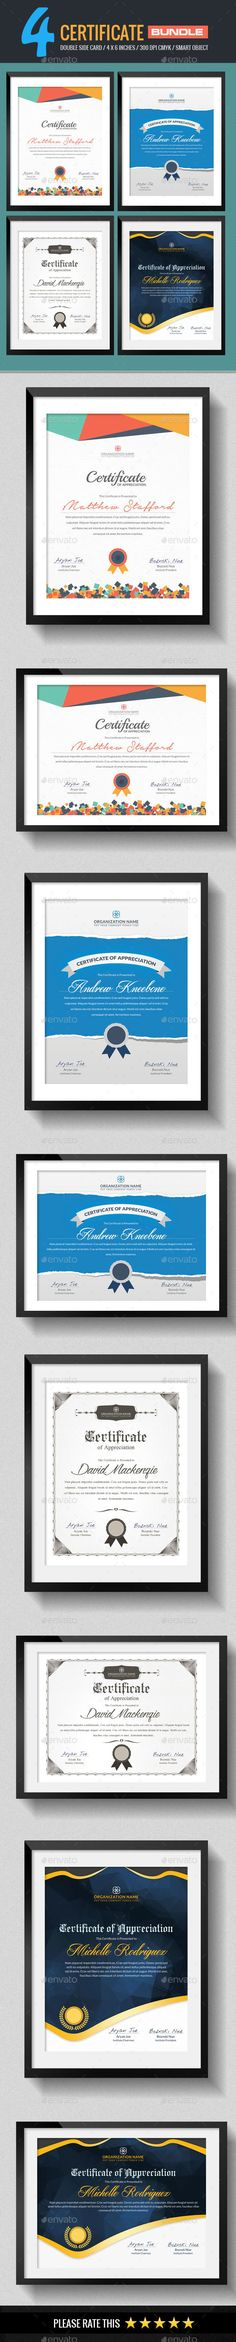 Certificate Template Certificate templates, Certificate design - certificate template software